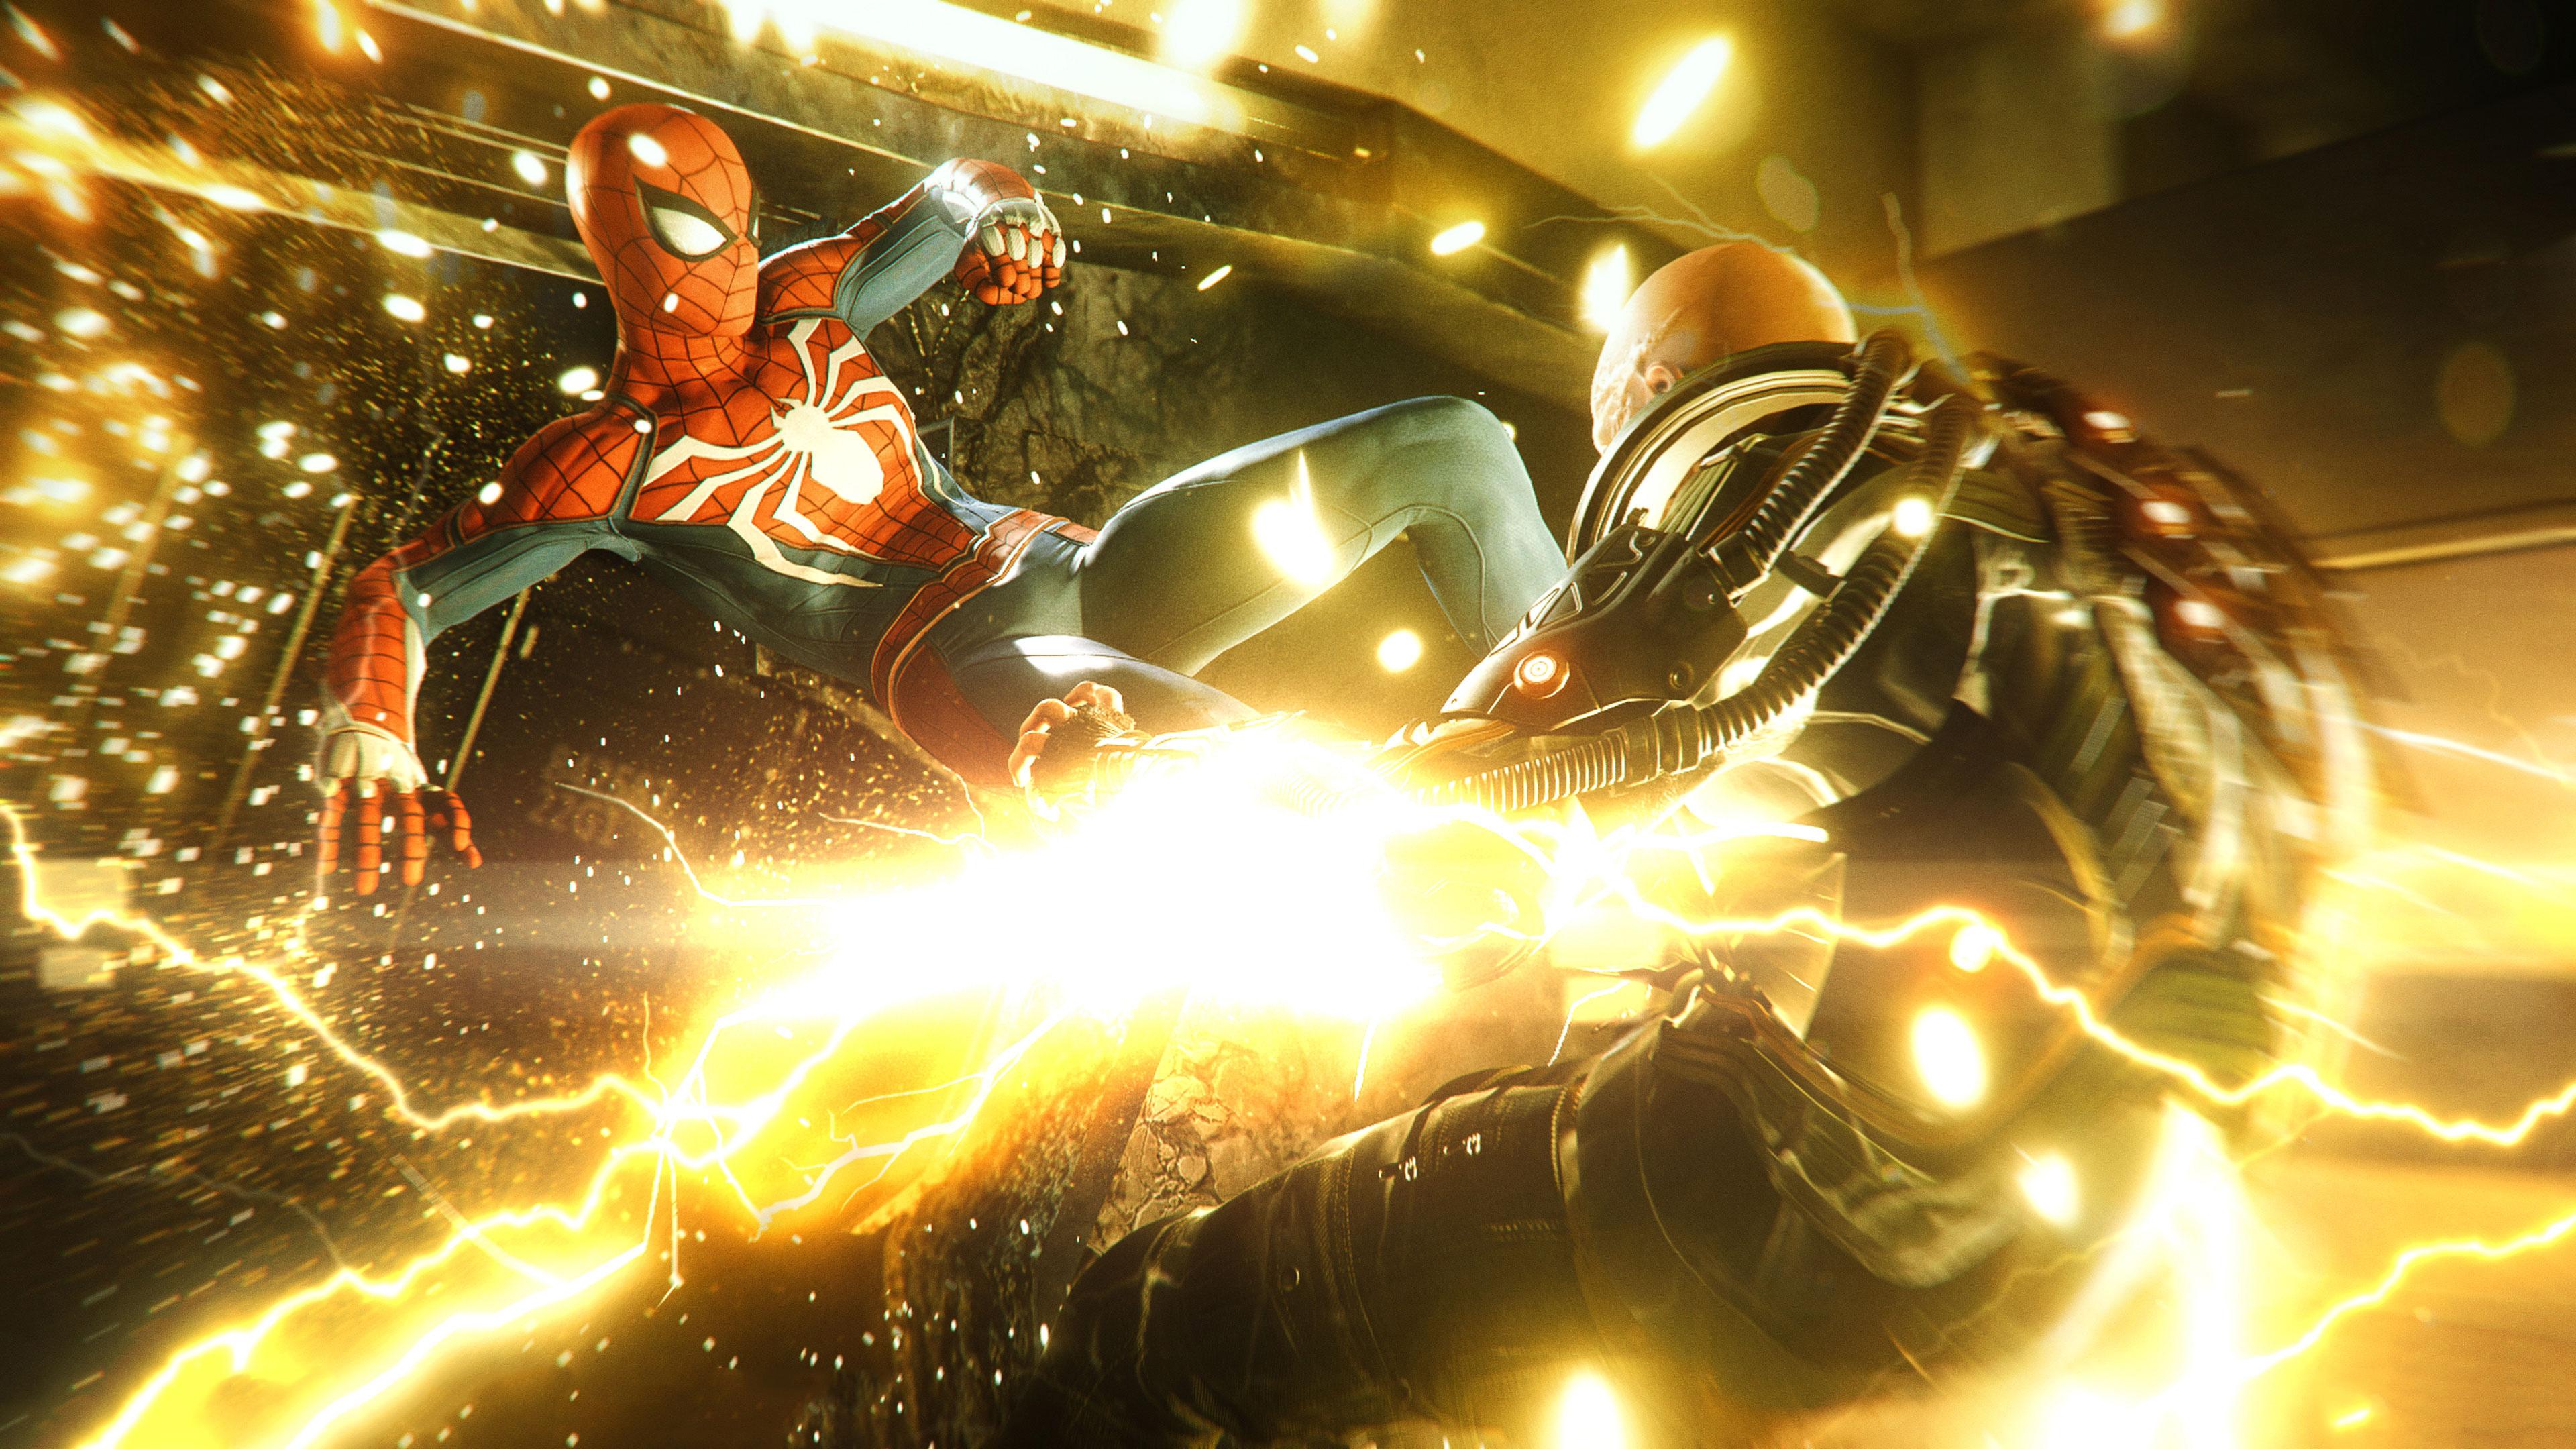 Spiderman Kicking Electro Hd Games 4k Wallpapers Images